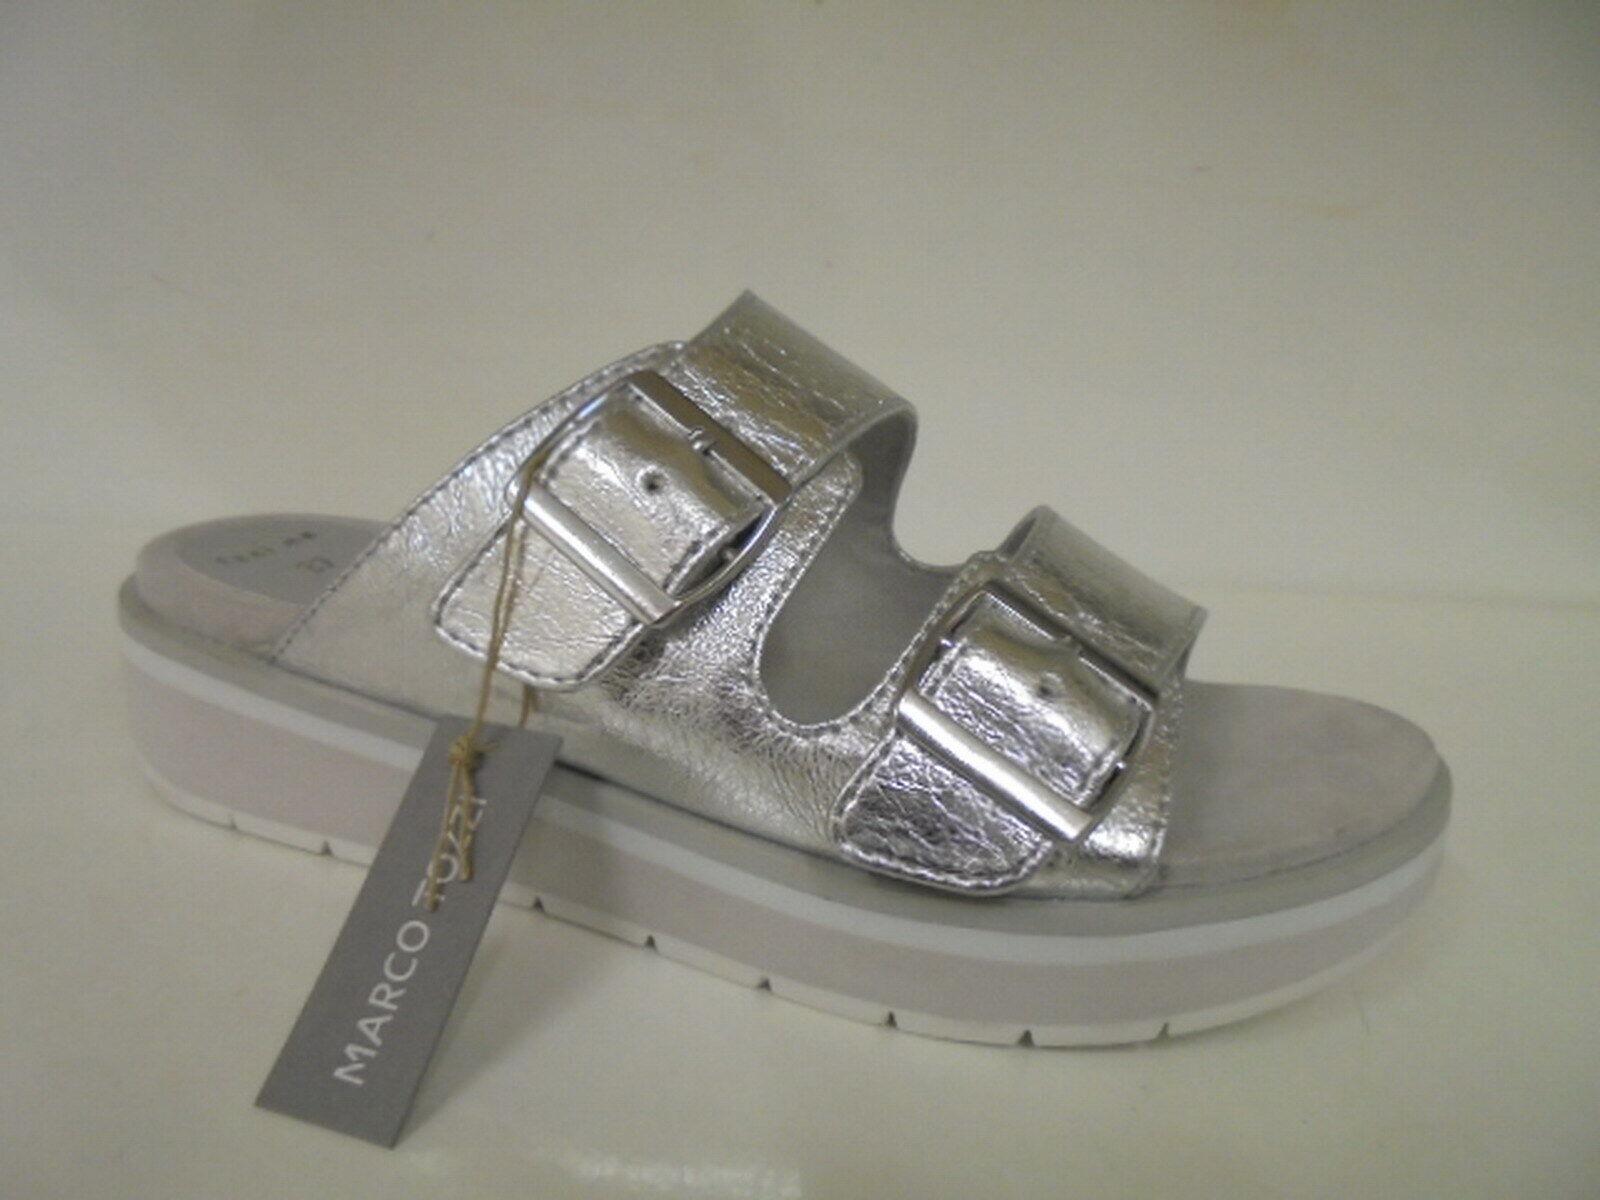 27206 Marco Tozzi Damenschuhe Sandale Pantolette silber Gr. 39